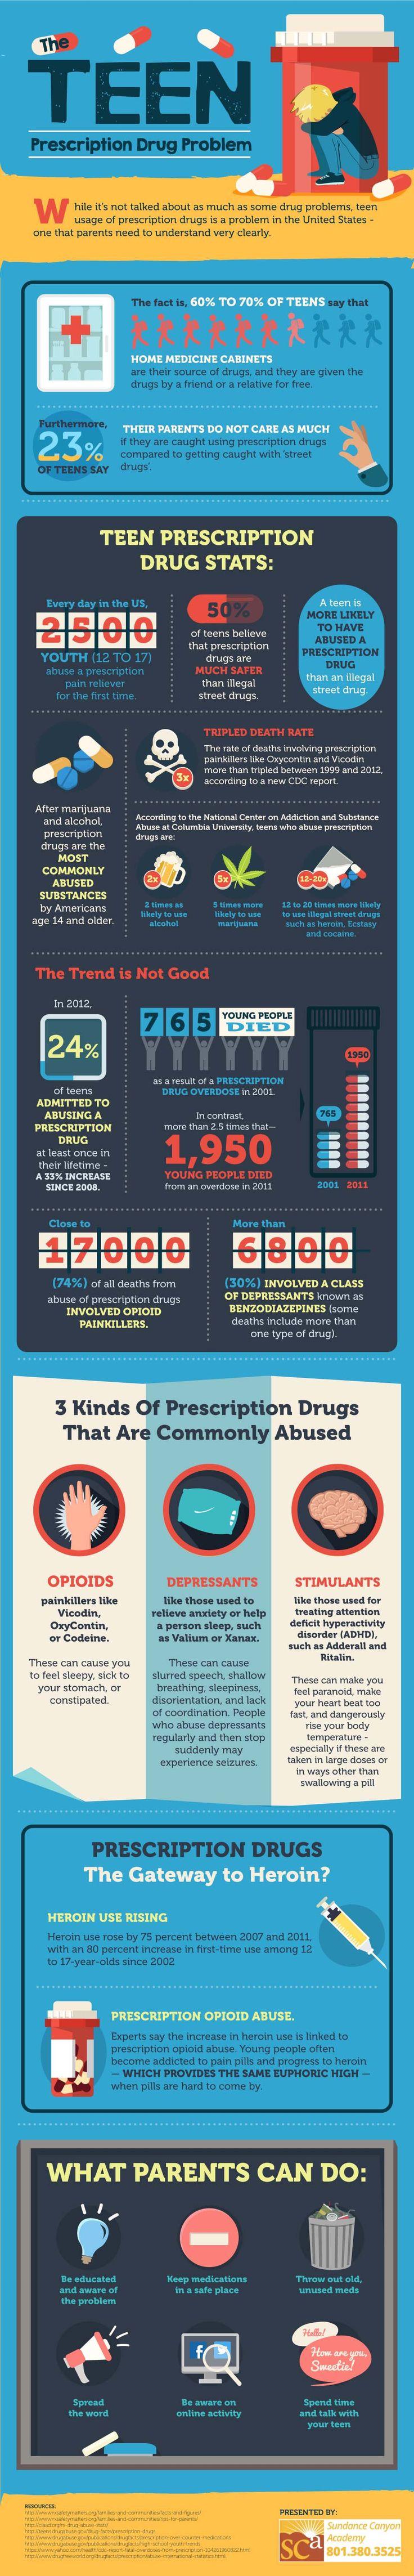 Teen Prescription Drug Use Problems